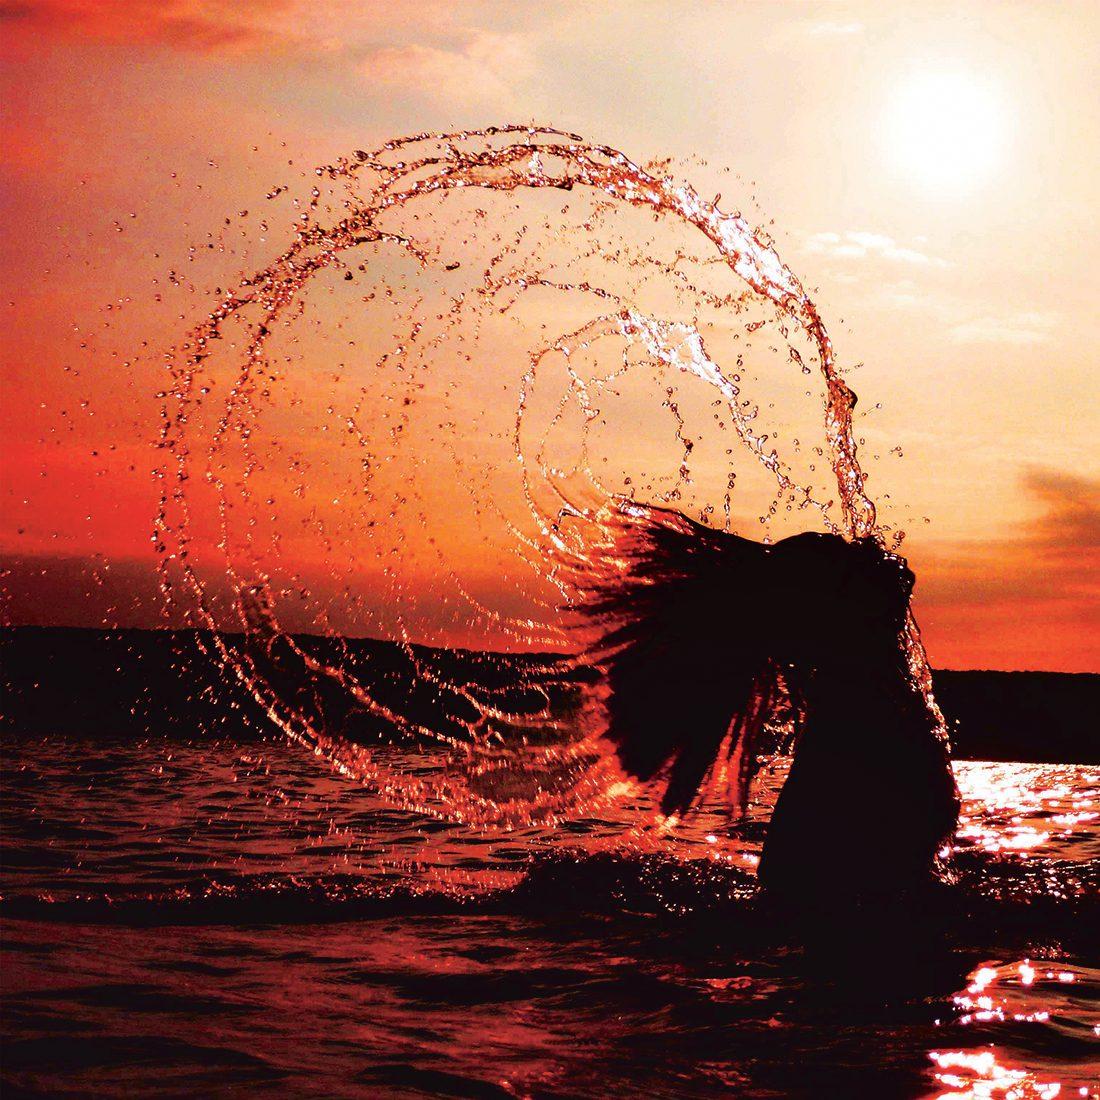 Making a splash water photography - sunset